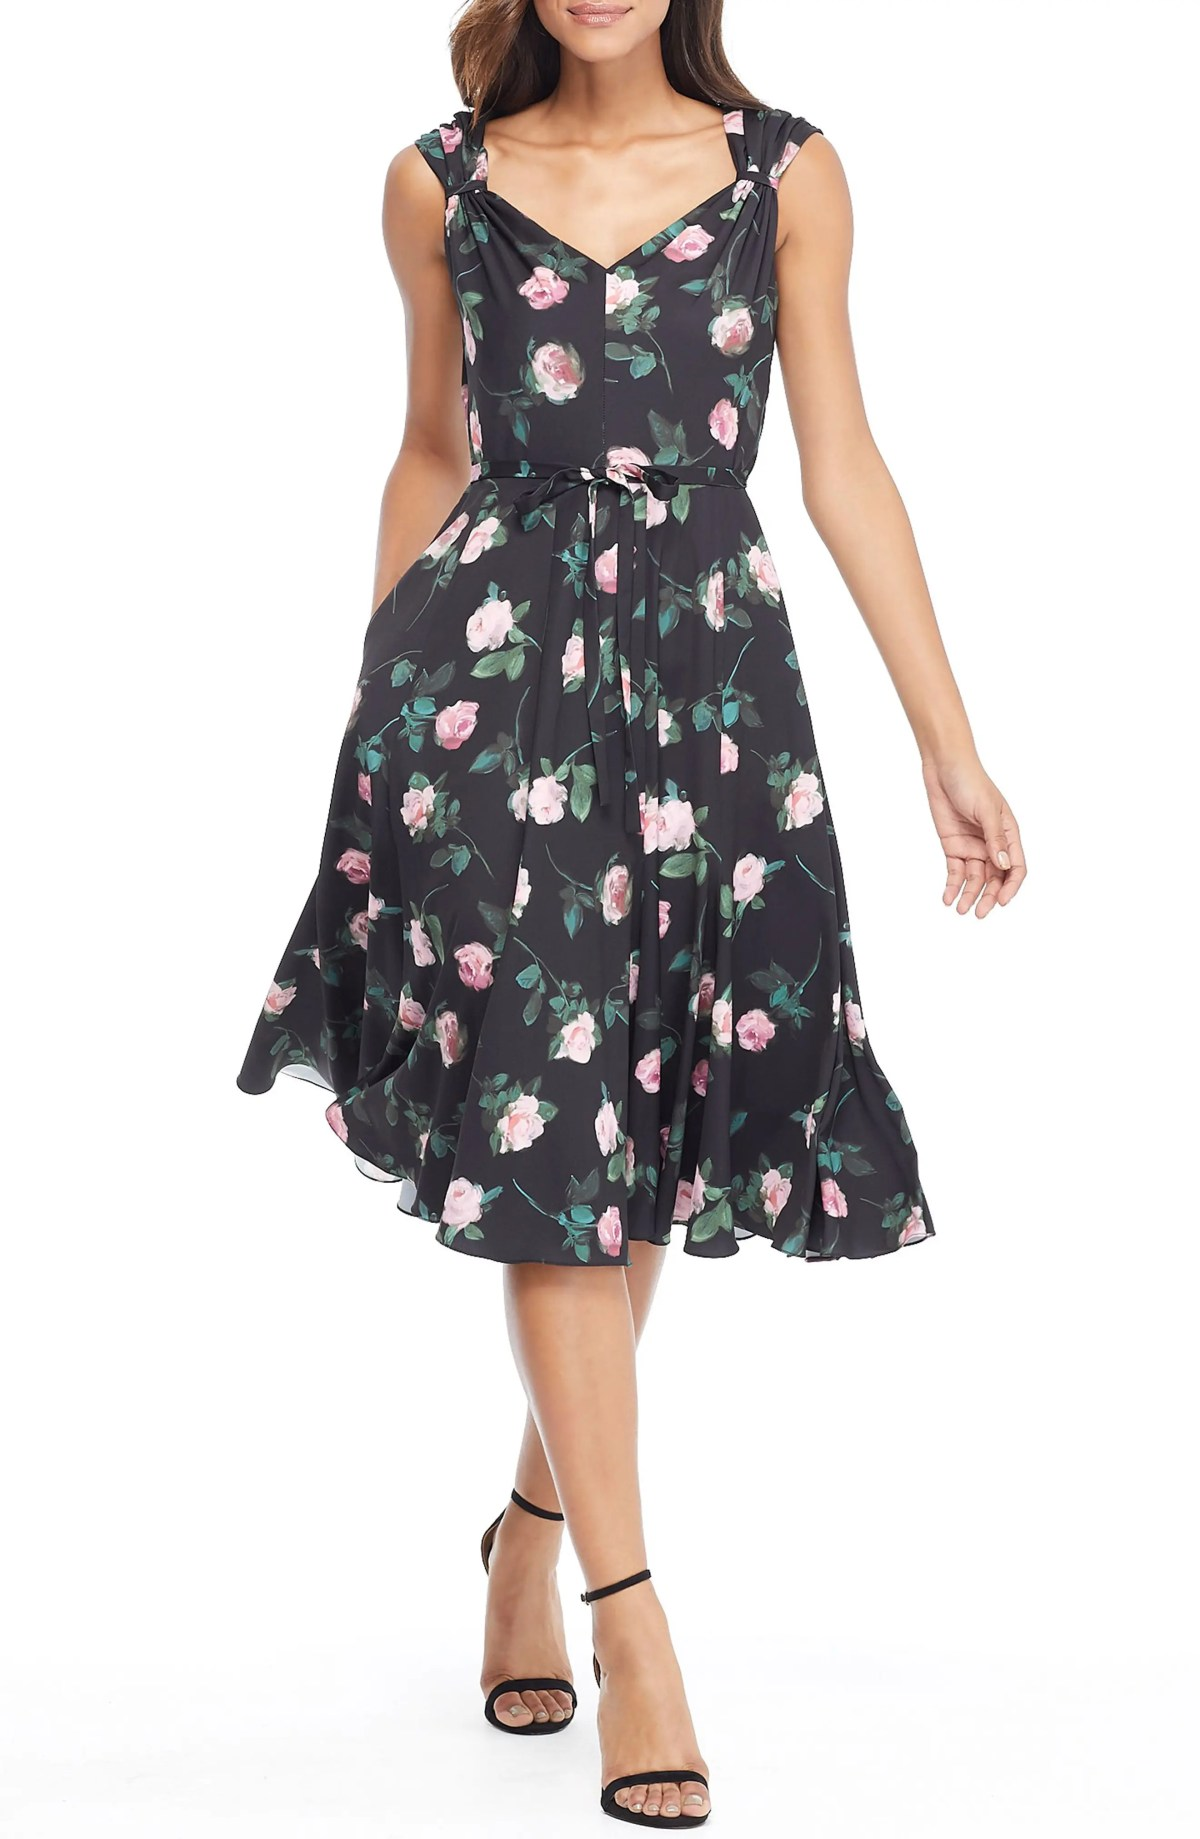 GAL MEETS GLAM COLLECTION Sadie Cowl Back Satin Dress, Main, color, BLACK/ SUGAR PLUM